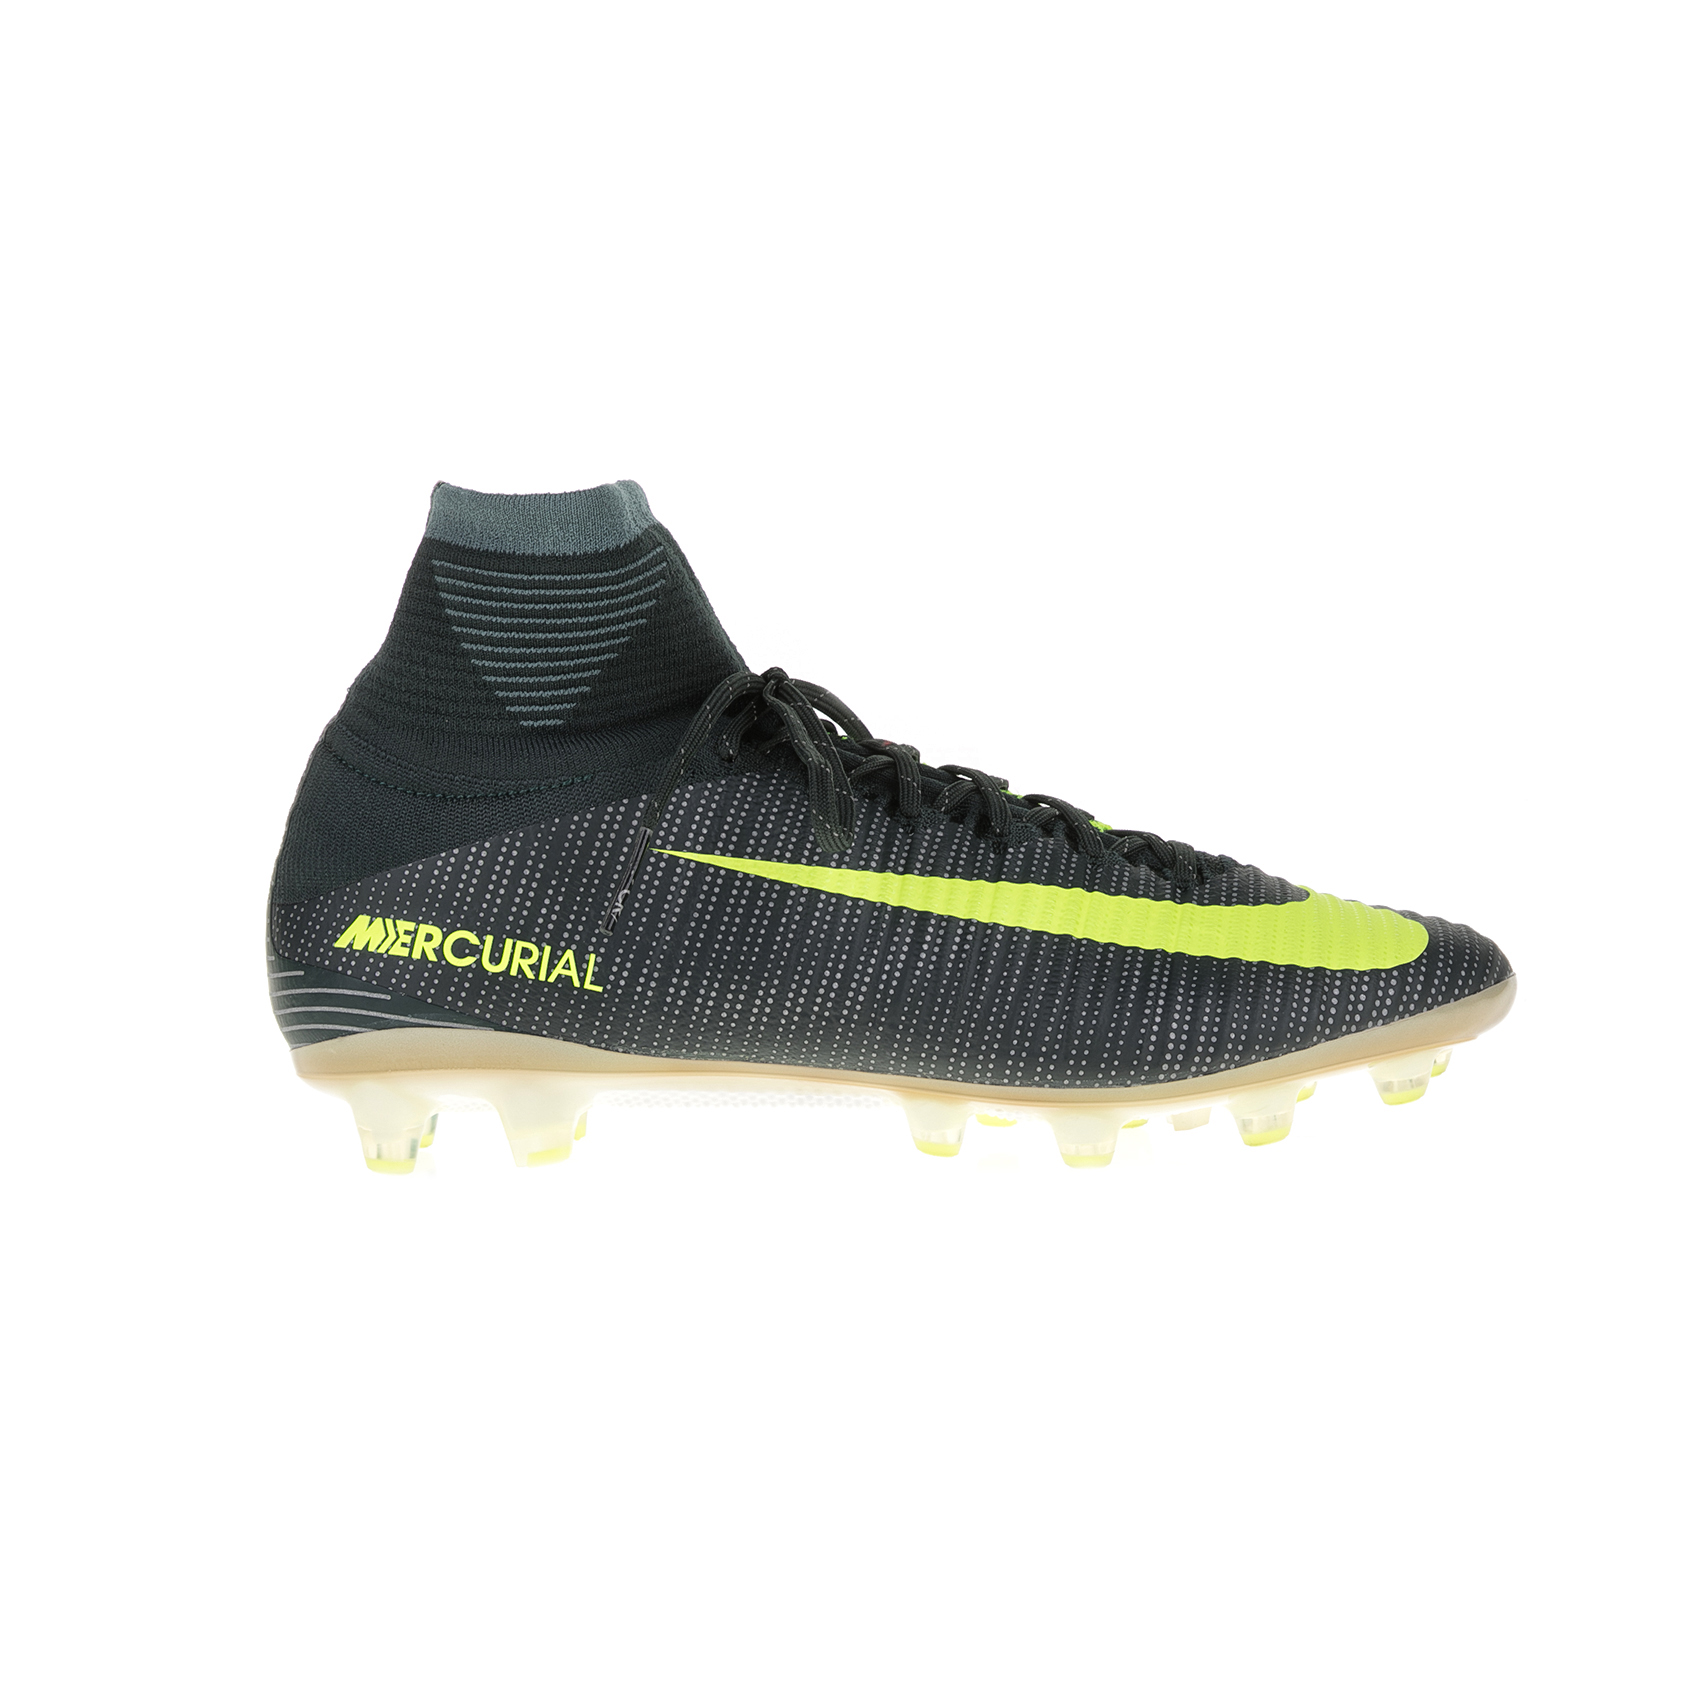 NIKE – Ανδρικά ποδοσφαιρικά παπούτσια Nike MERCURIAL SUPERFLY V CR7 AGPRO μαύρα – κίτρινα